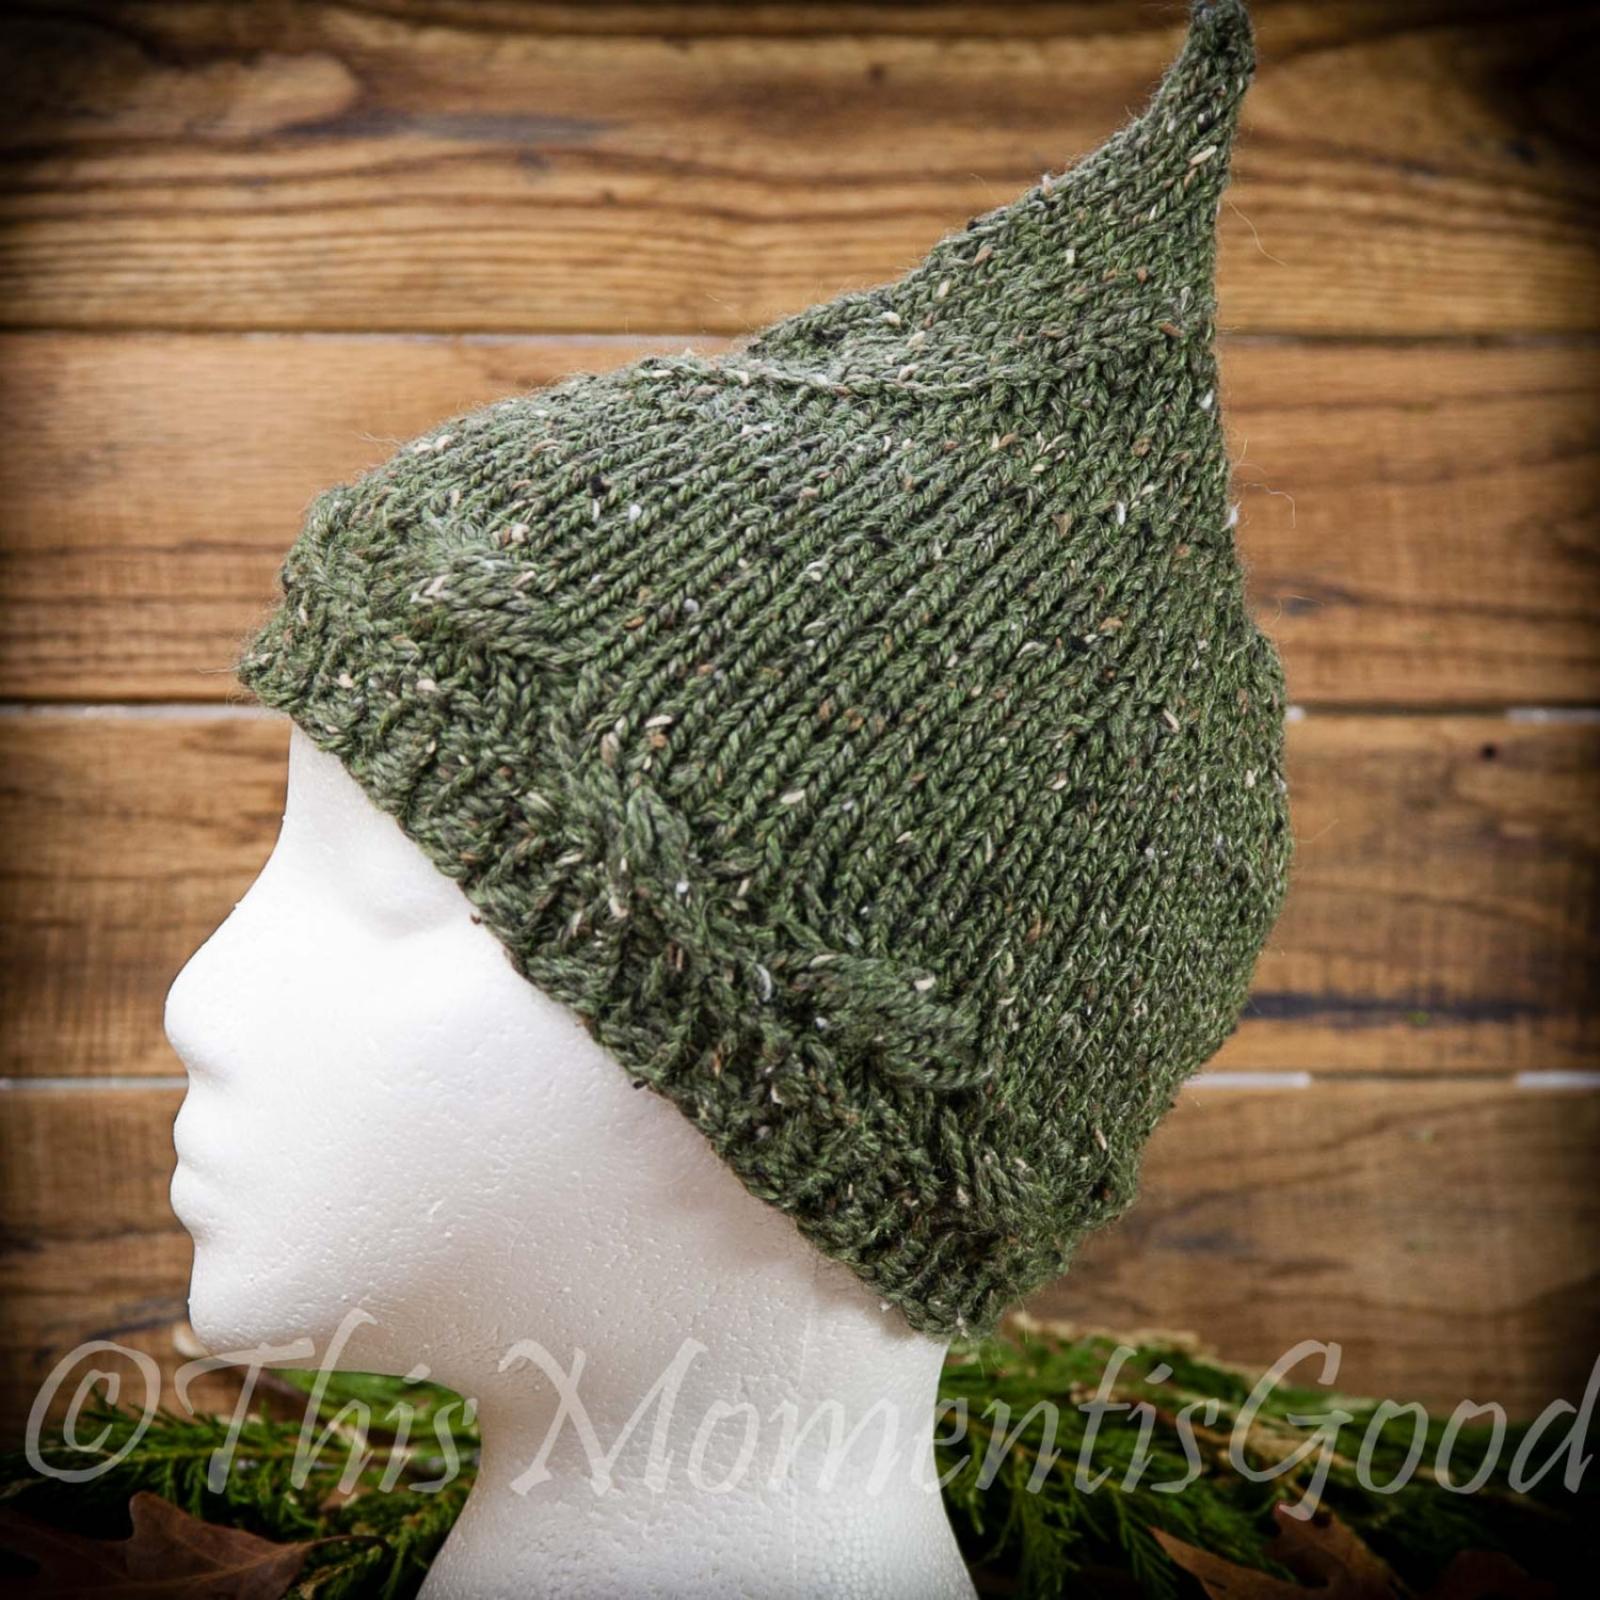 Knitting Pattern For Elf Hat : LOOM KNIT PIXIE HAT PATTERN. LADIES/TEEN PIXIE HAT. ELF ...